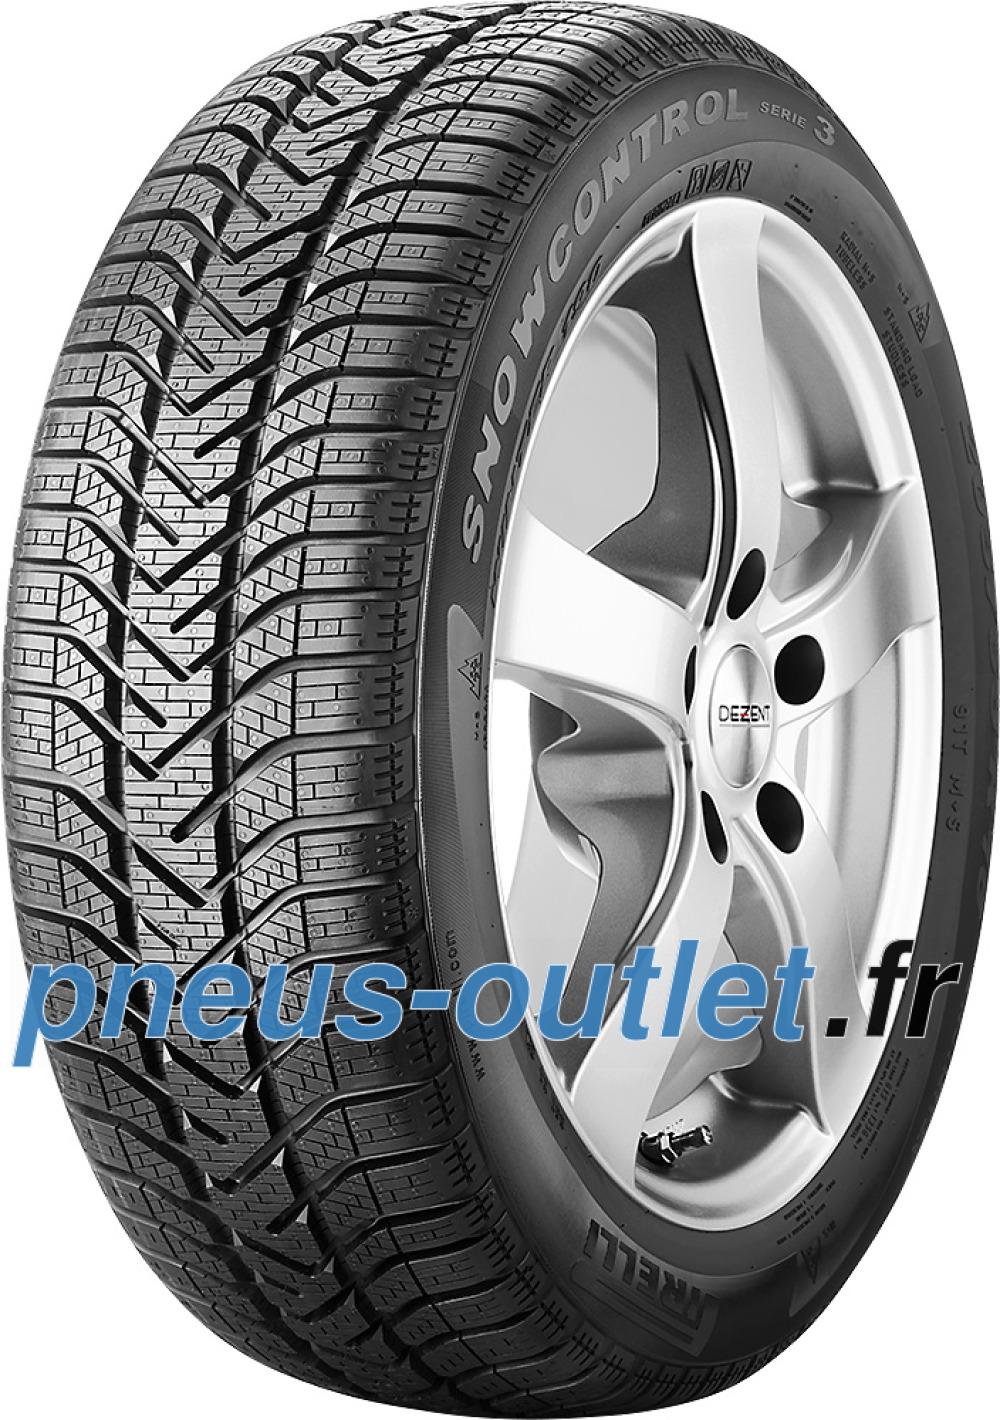 Pirelli W 190 Snowcontrol Serie III ( 185/65 R15 92T XL ECOIMPACT )